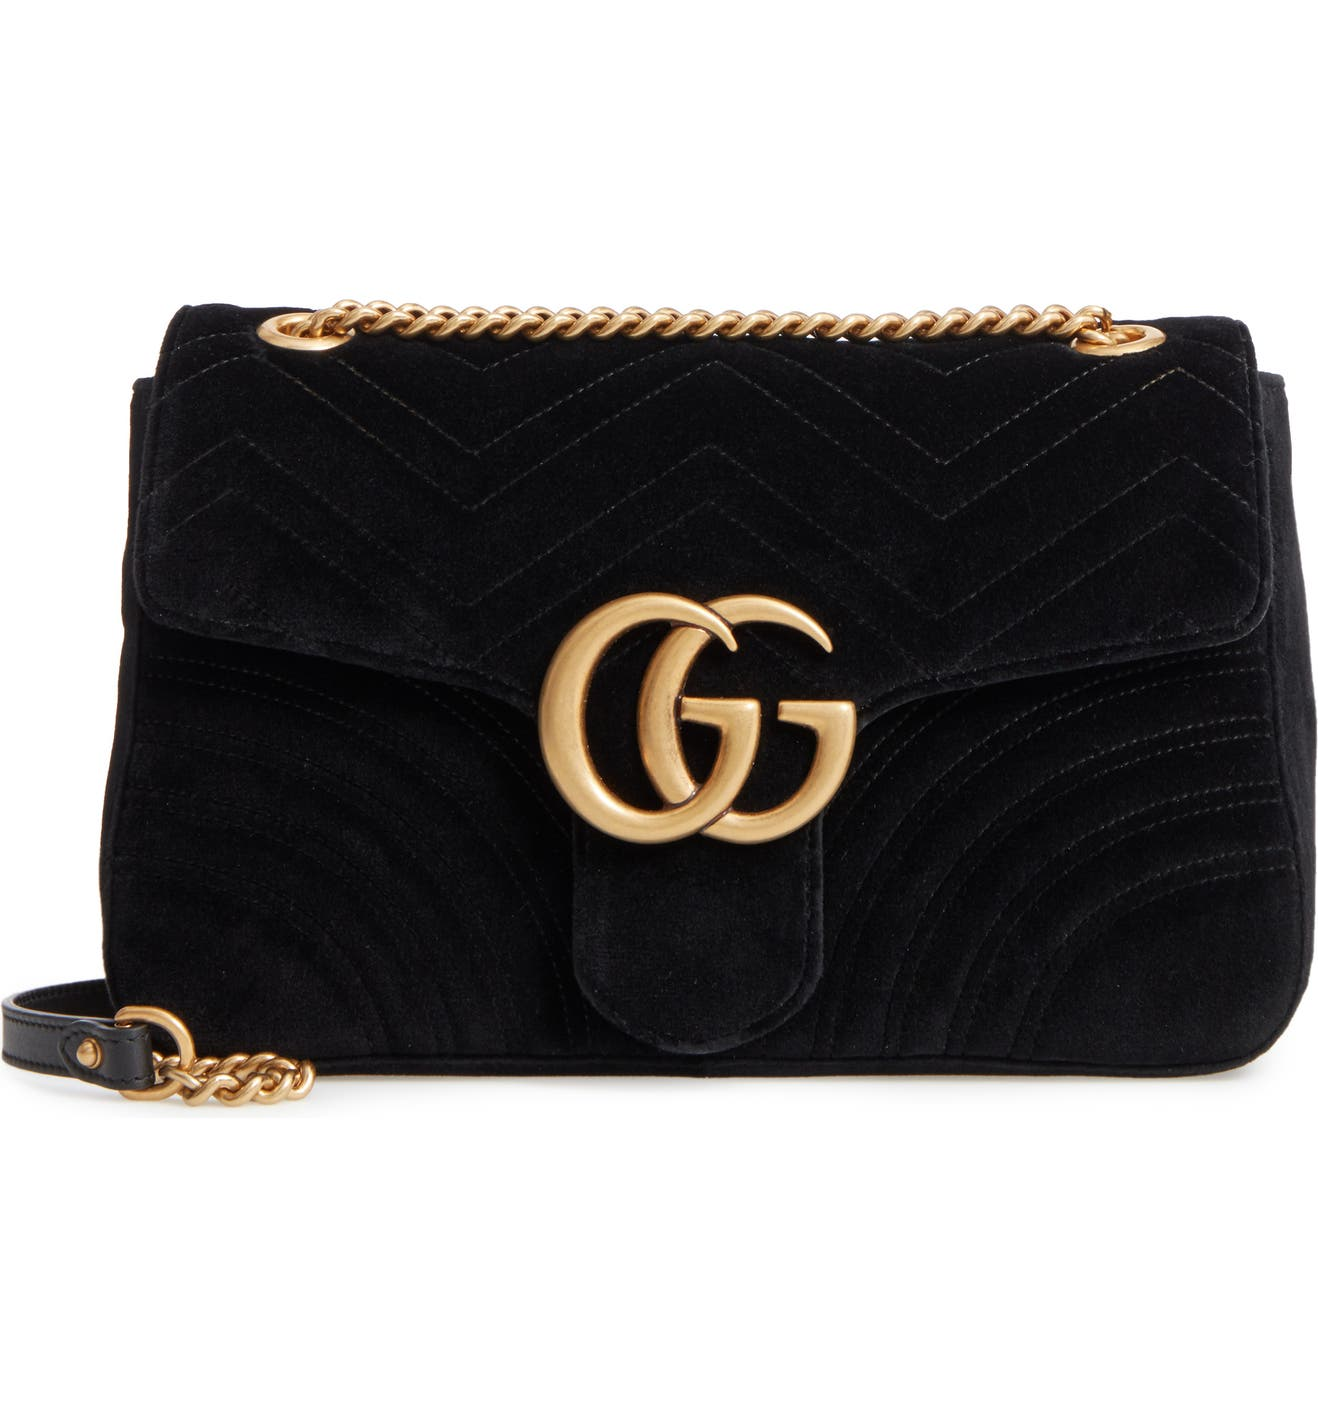 6ae27b2967d4 Gucci Medium GG Marmont 2.0 Matelassé Velvet Shoulder Bag | Nordstrom